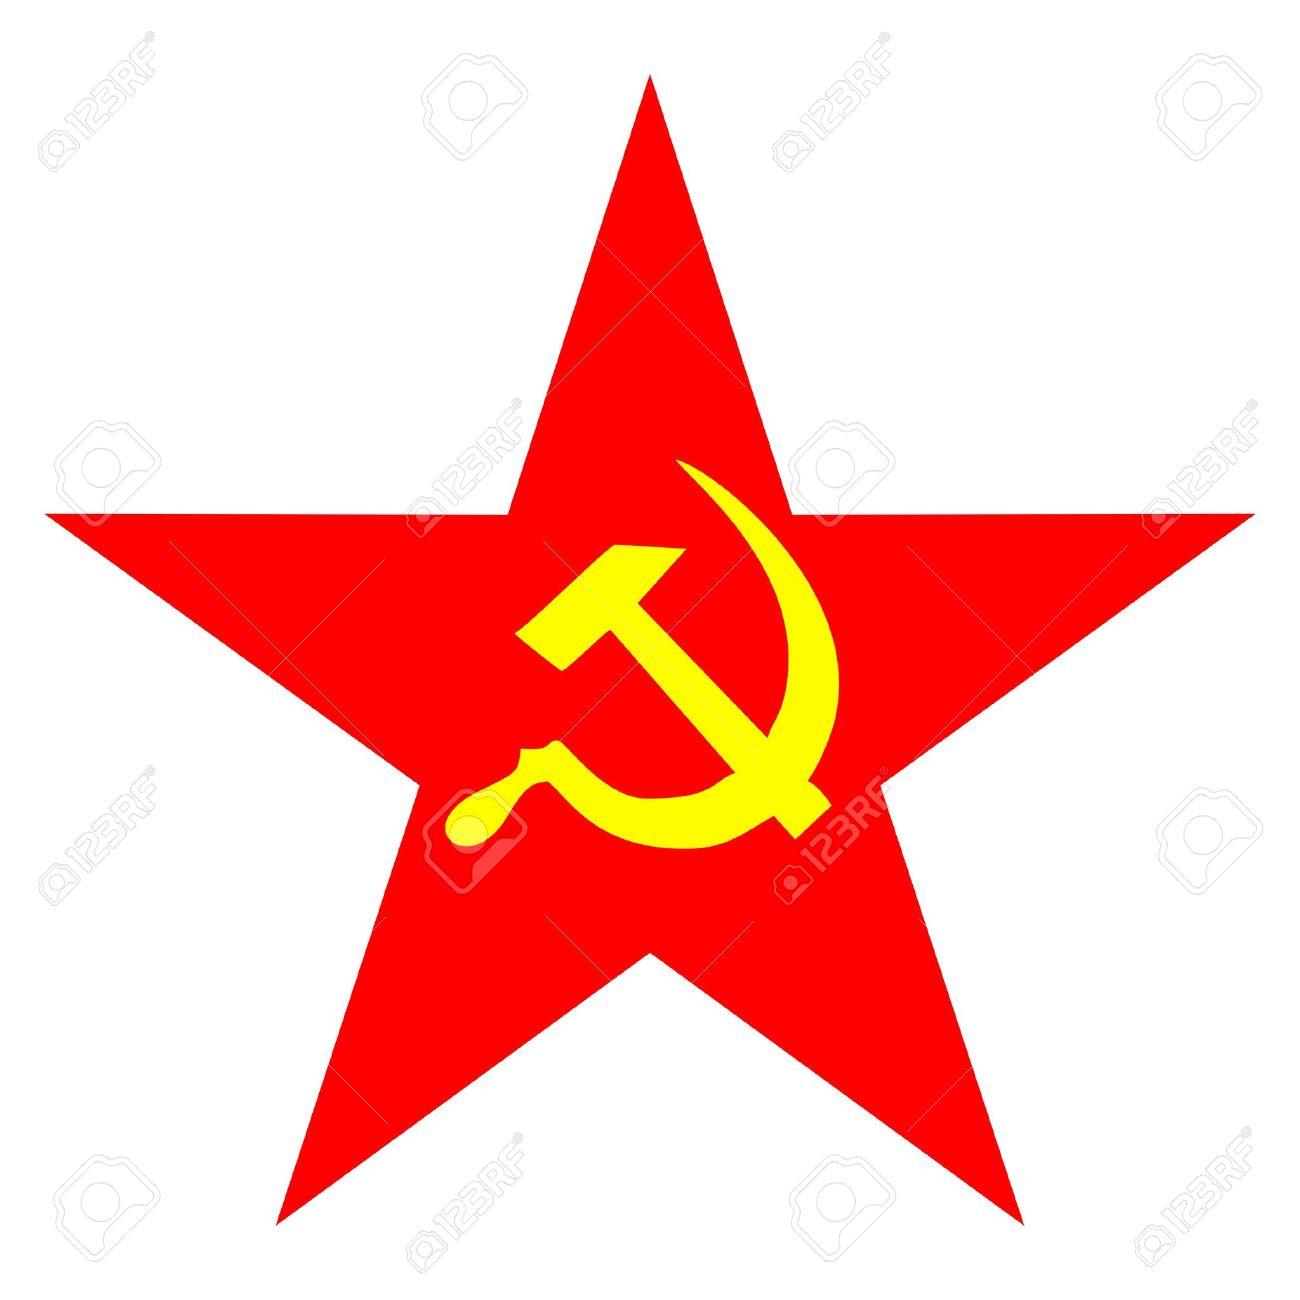 Communist Symbol Star Communist Star illustration